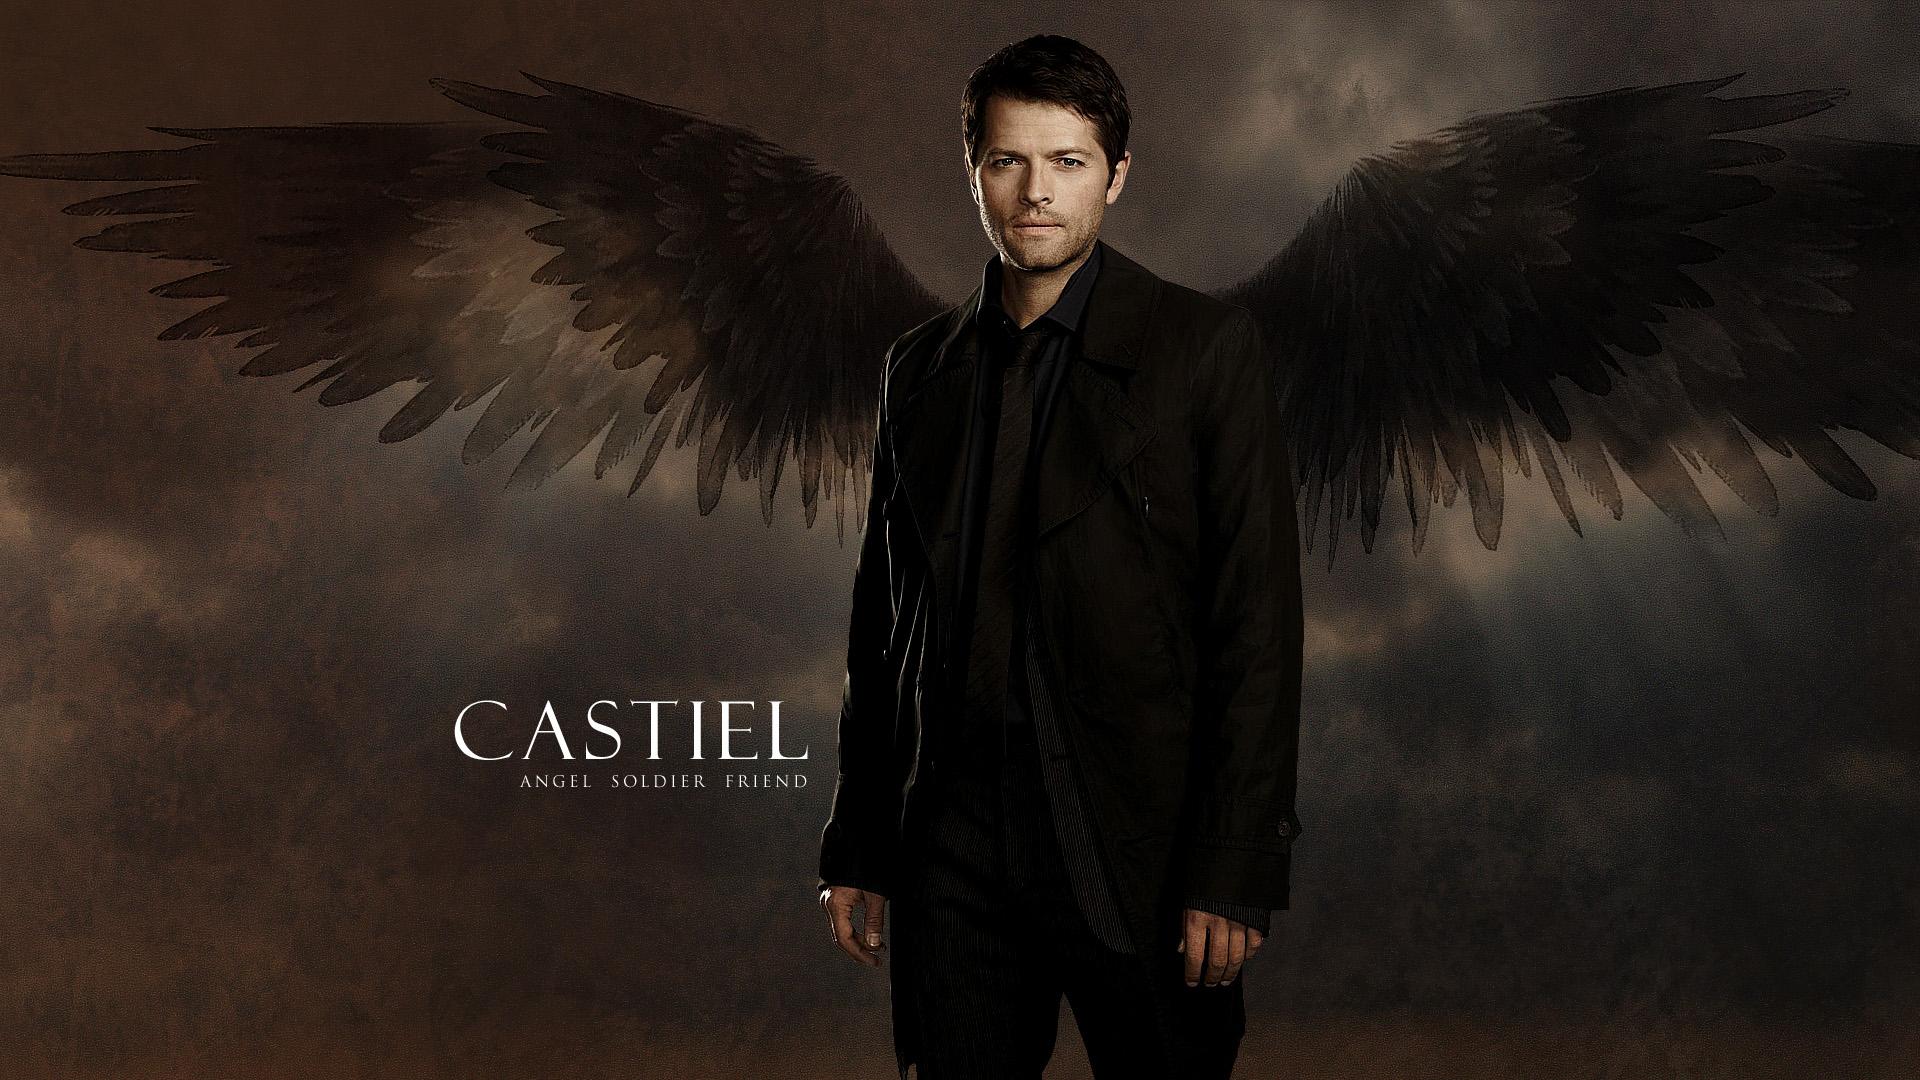 Castiel Dark Angel by drksde 1920x1080